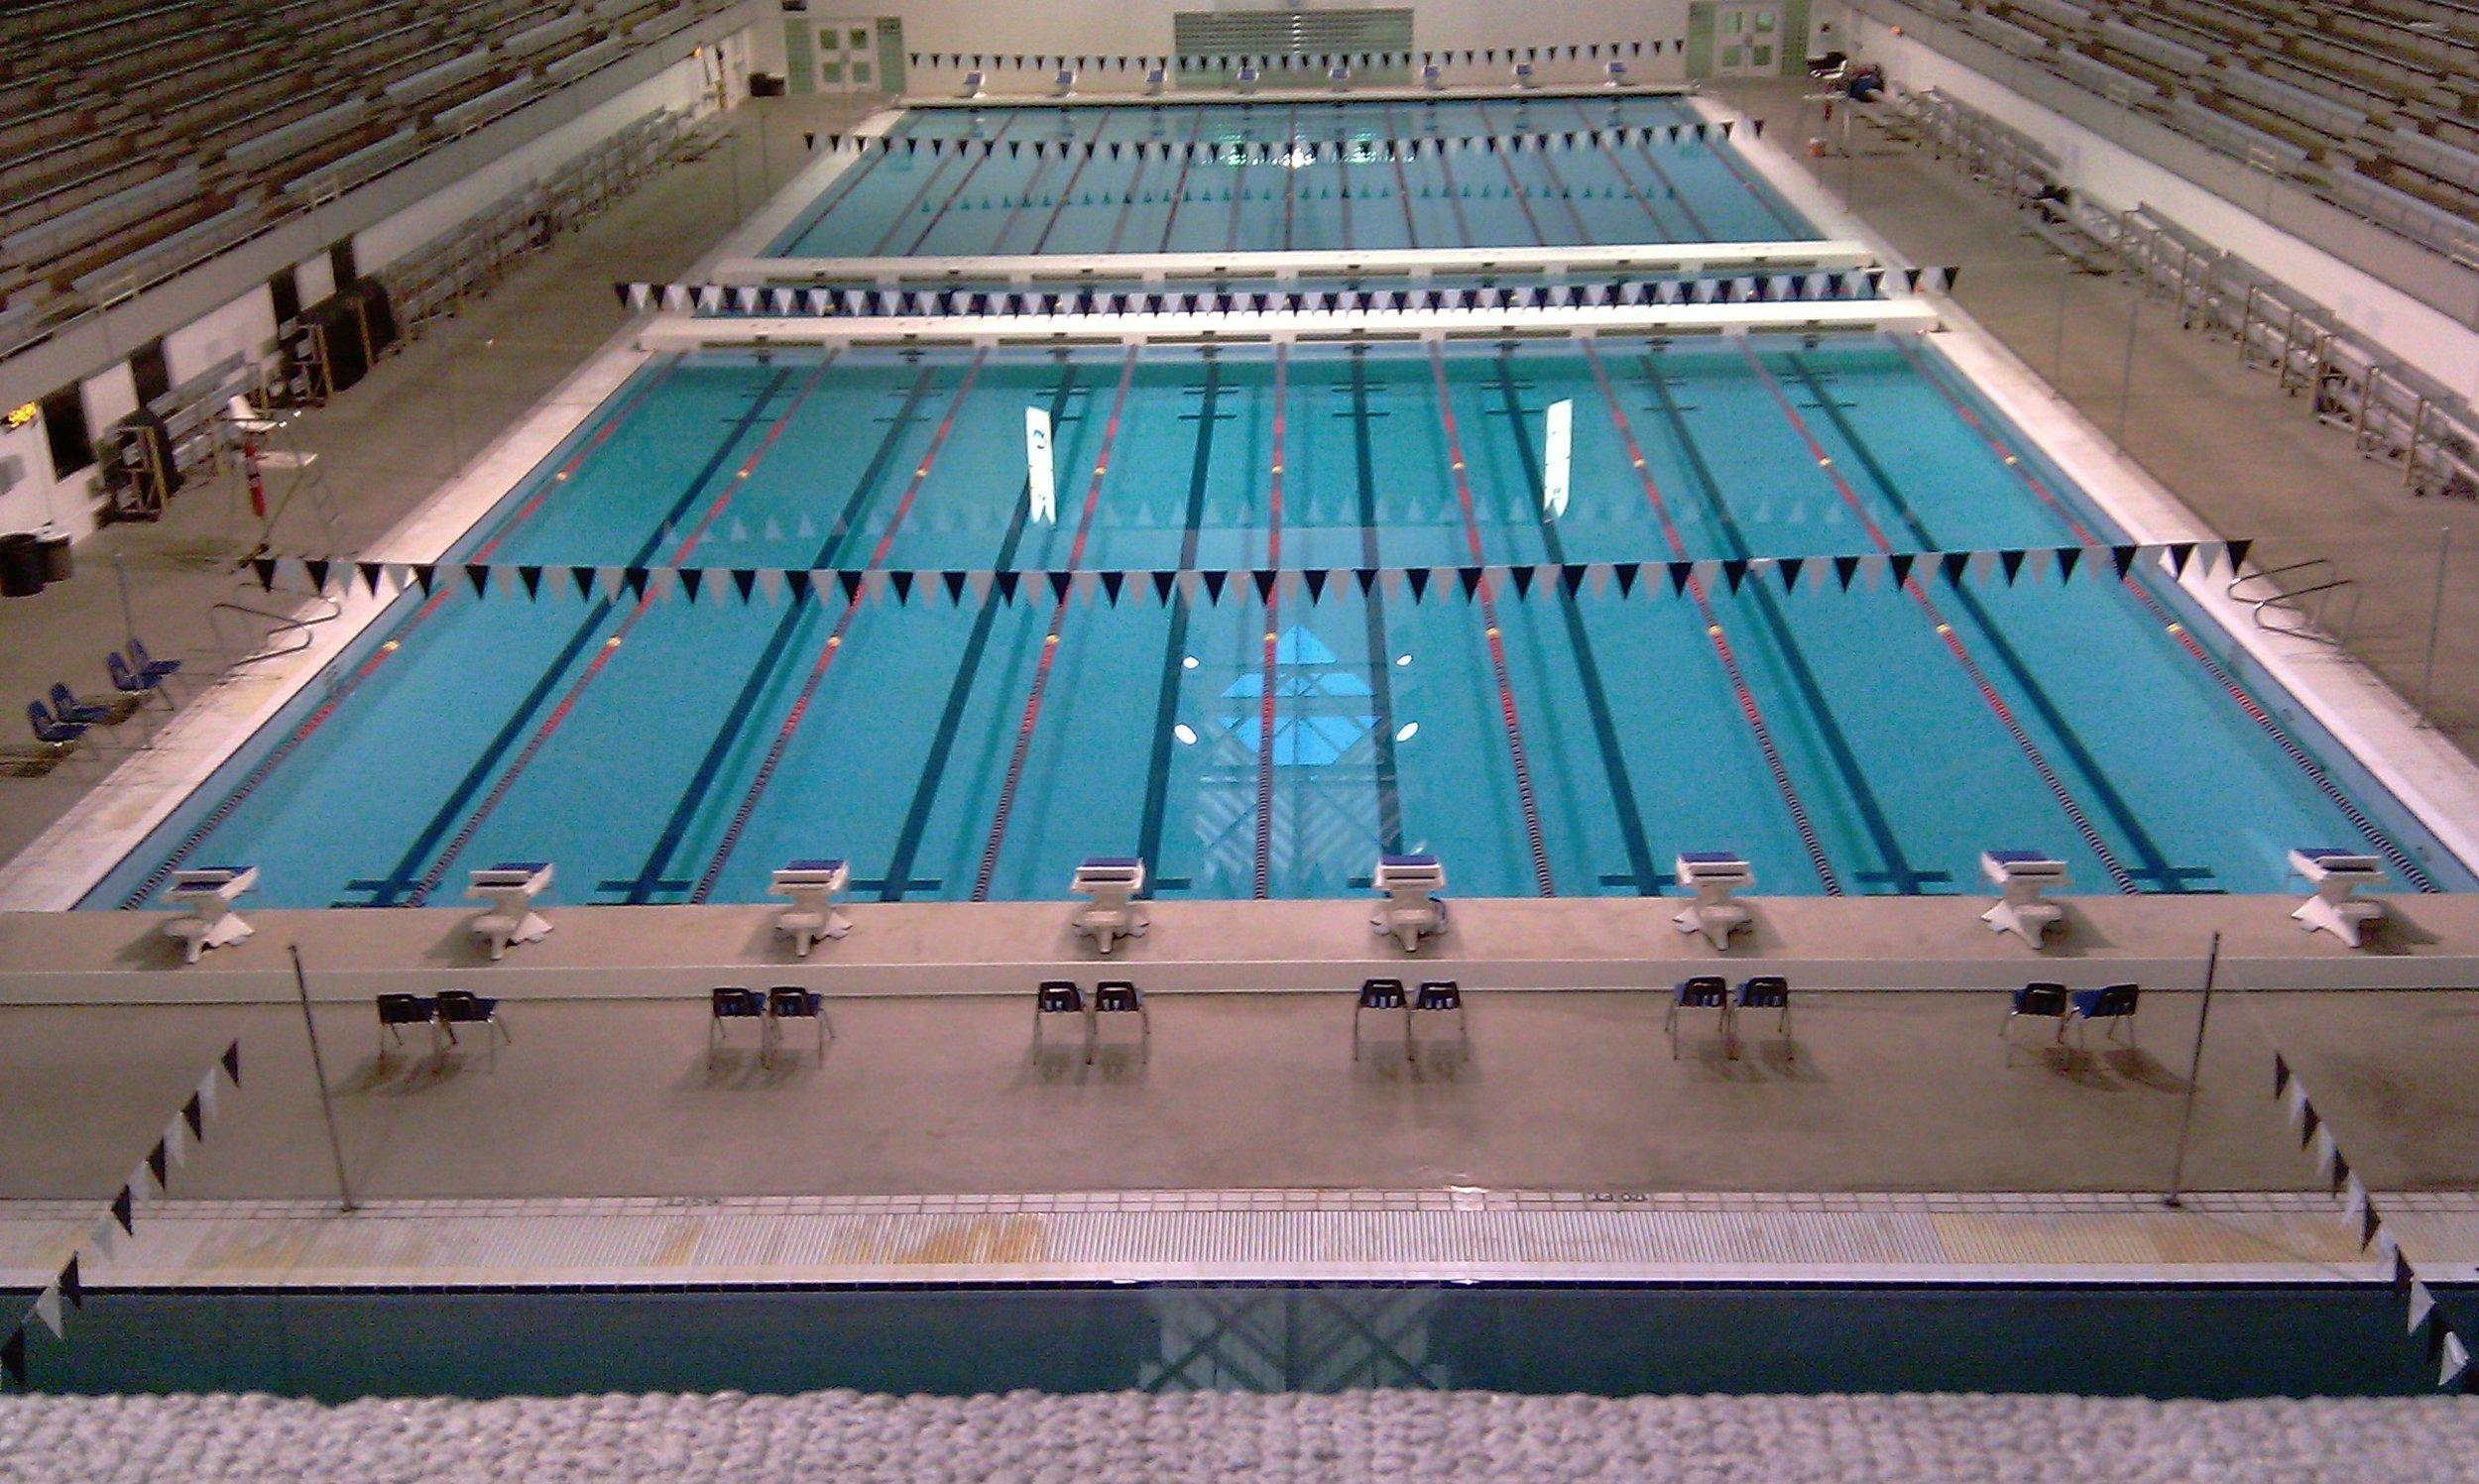 King-County-Aquatic-Center.jpg